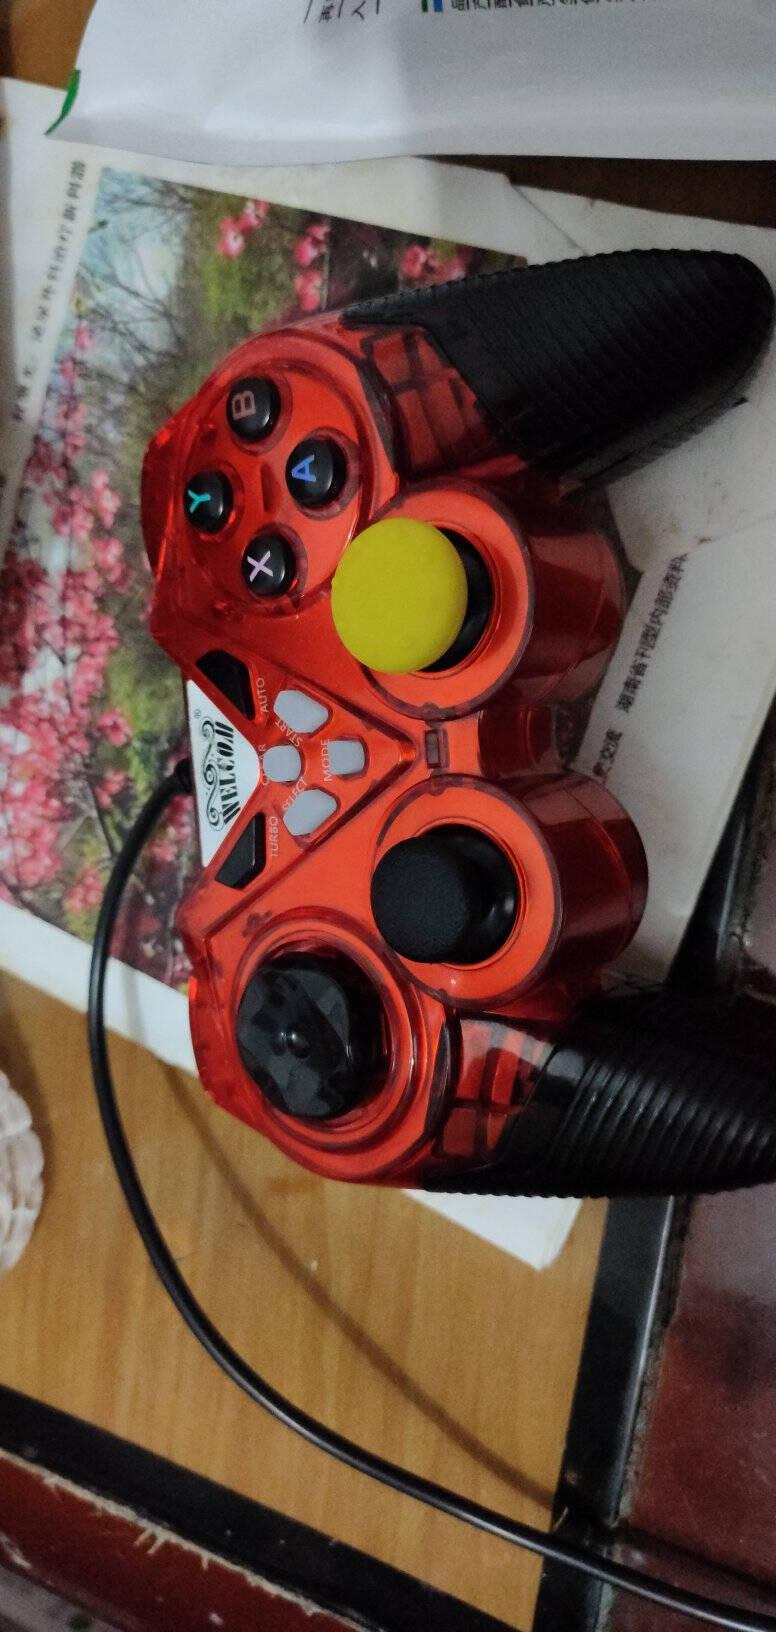 welcom游戏手柄电脑PC安卓电视Xbox360精英PS3有线FIFA赛博朋克NBA2K双打震动黑色【升级版】